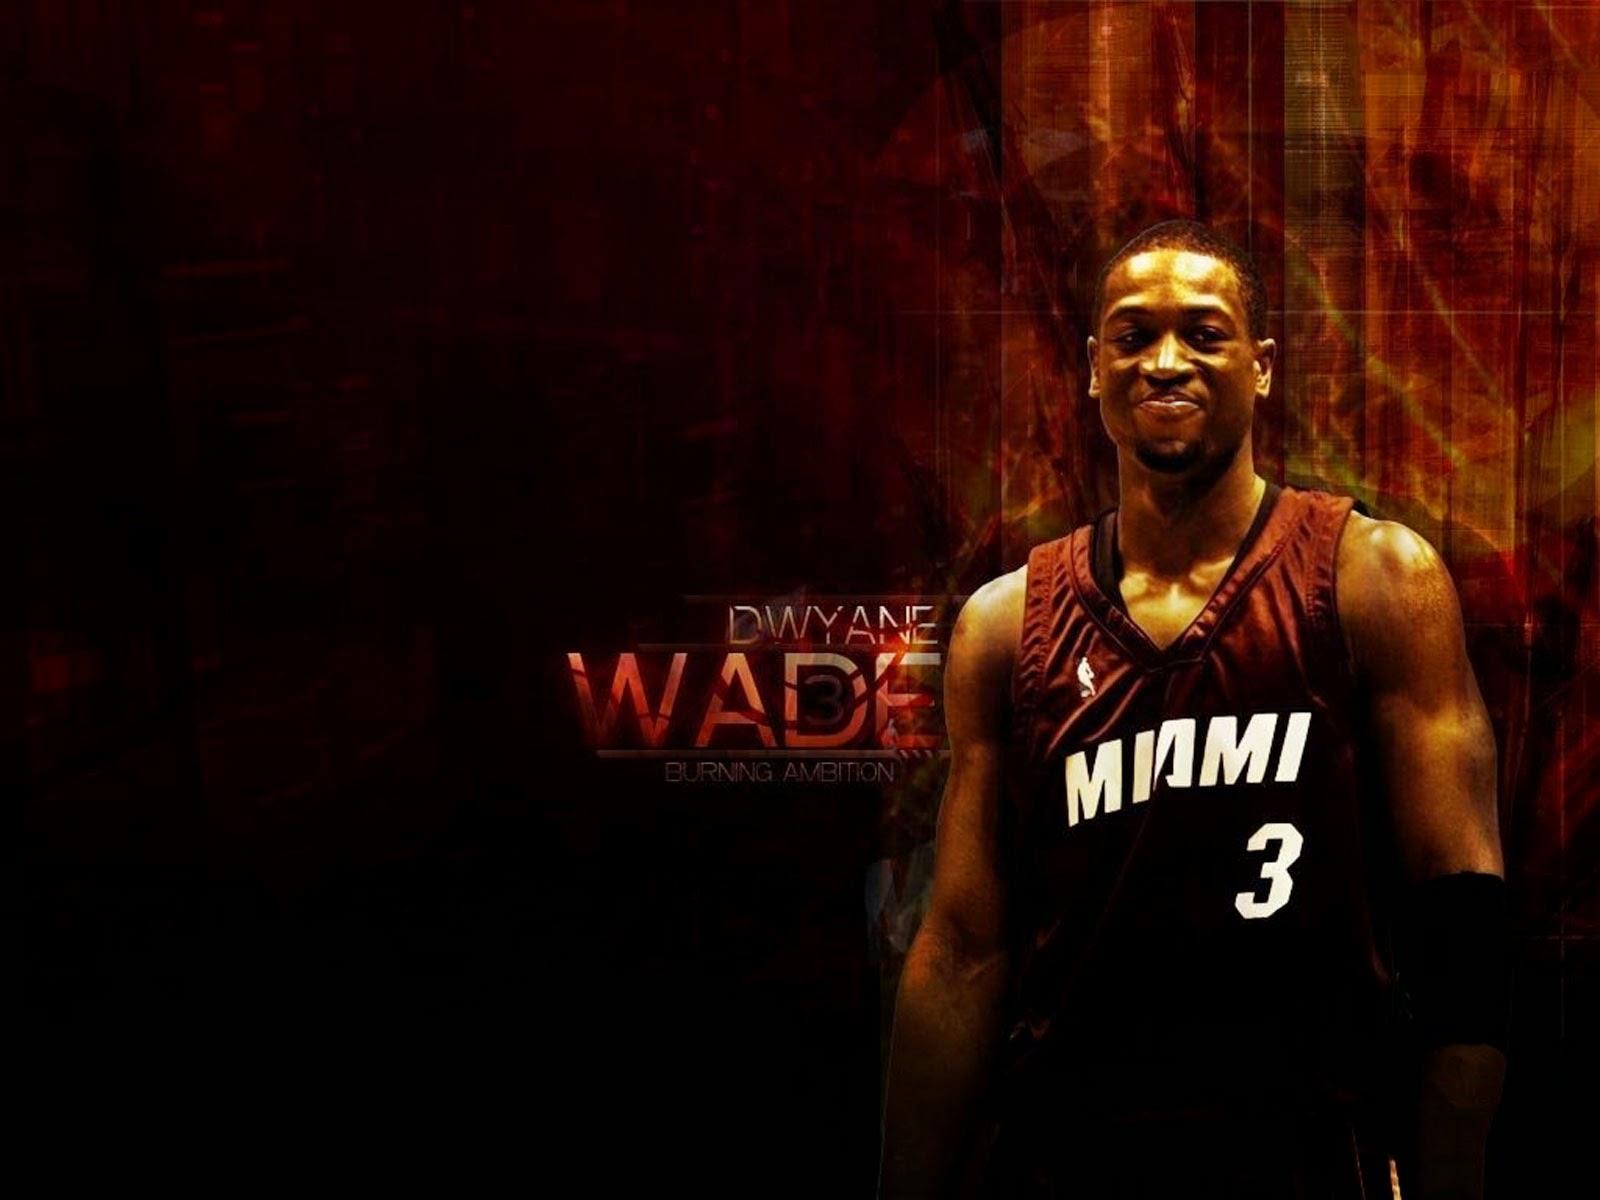 Wallpapers Dwyane Wade NBA HD   Fondos De pantallasWallpaper 1600x1200